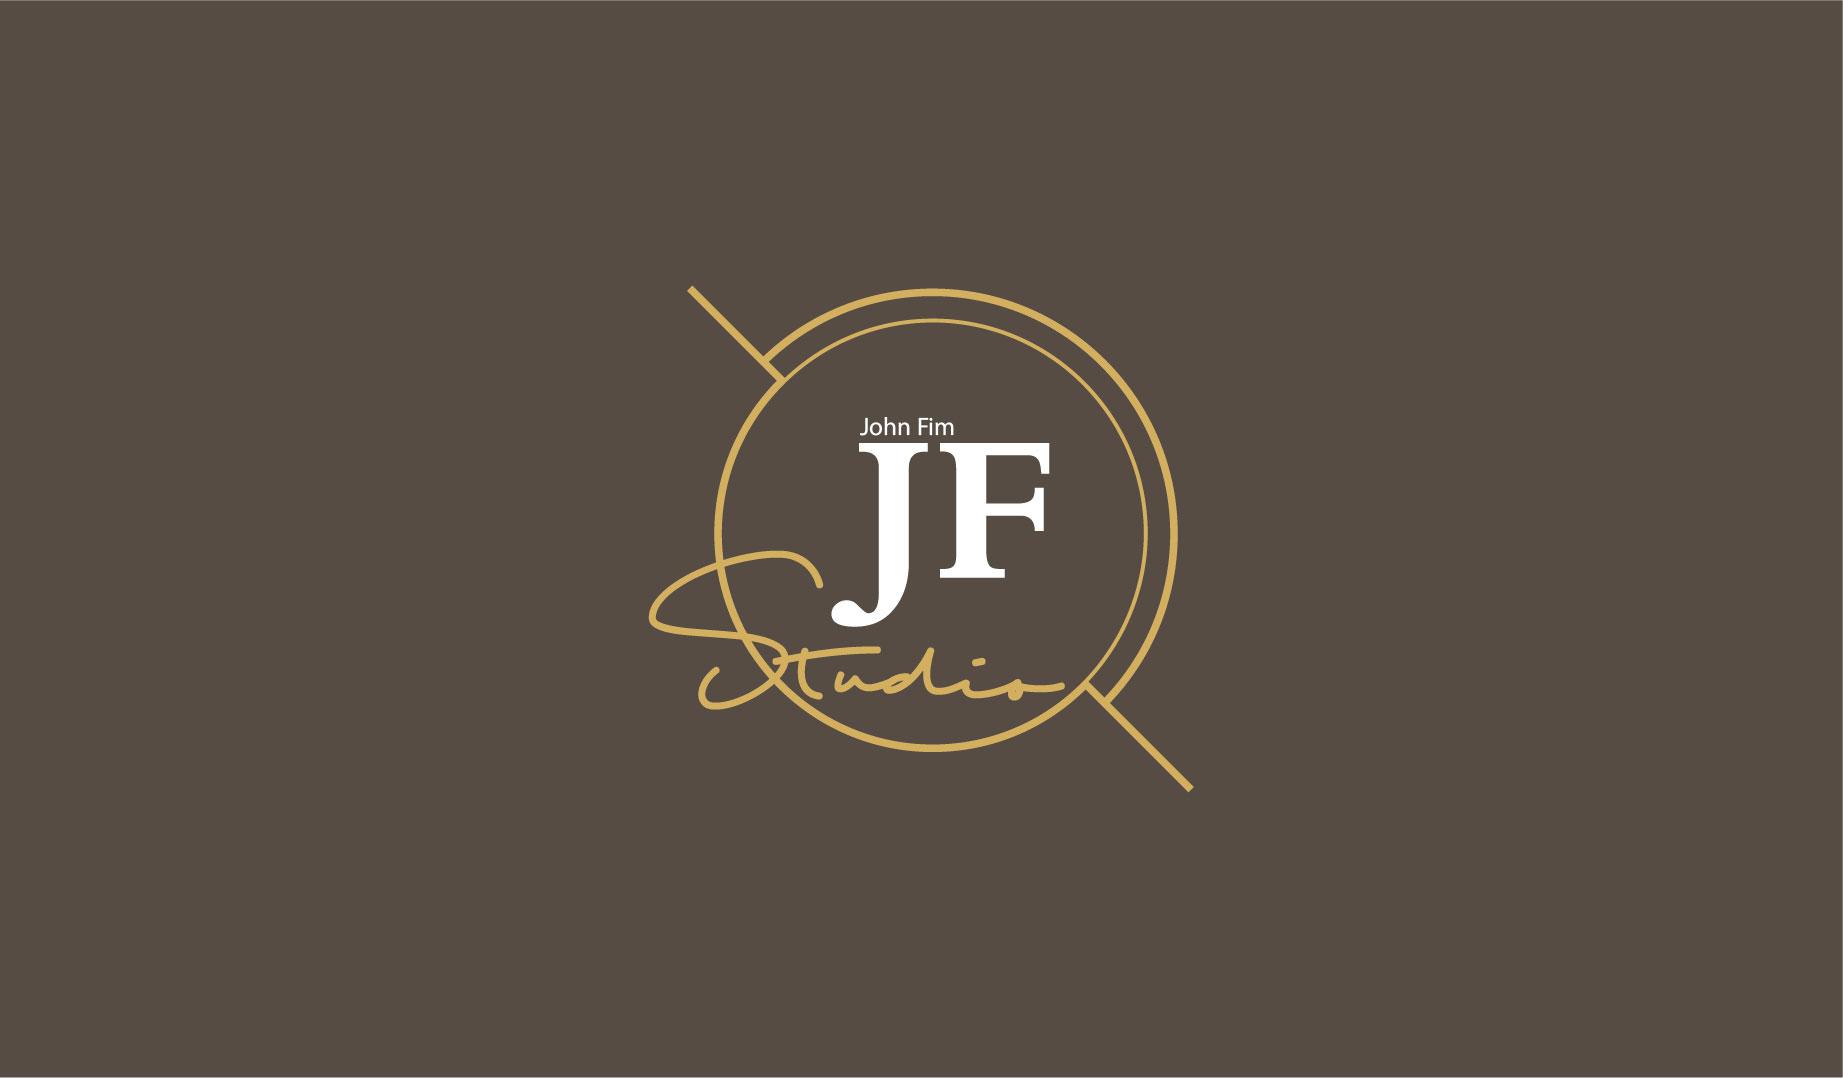 logo design service for Jhon Film